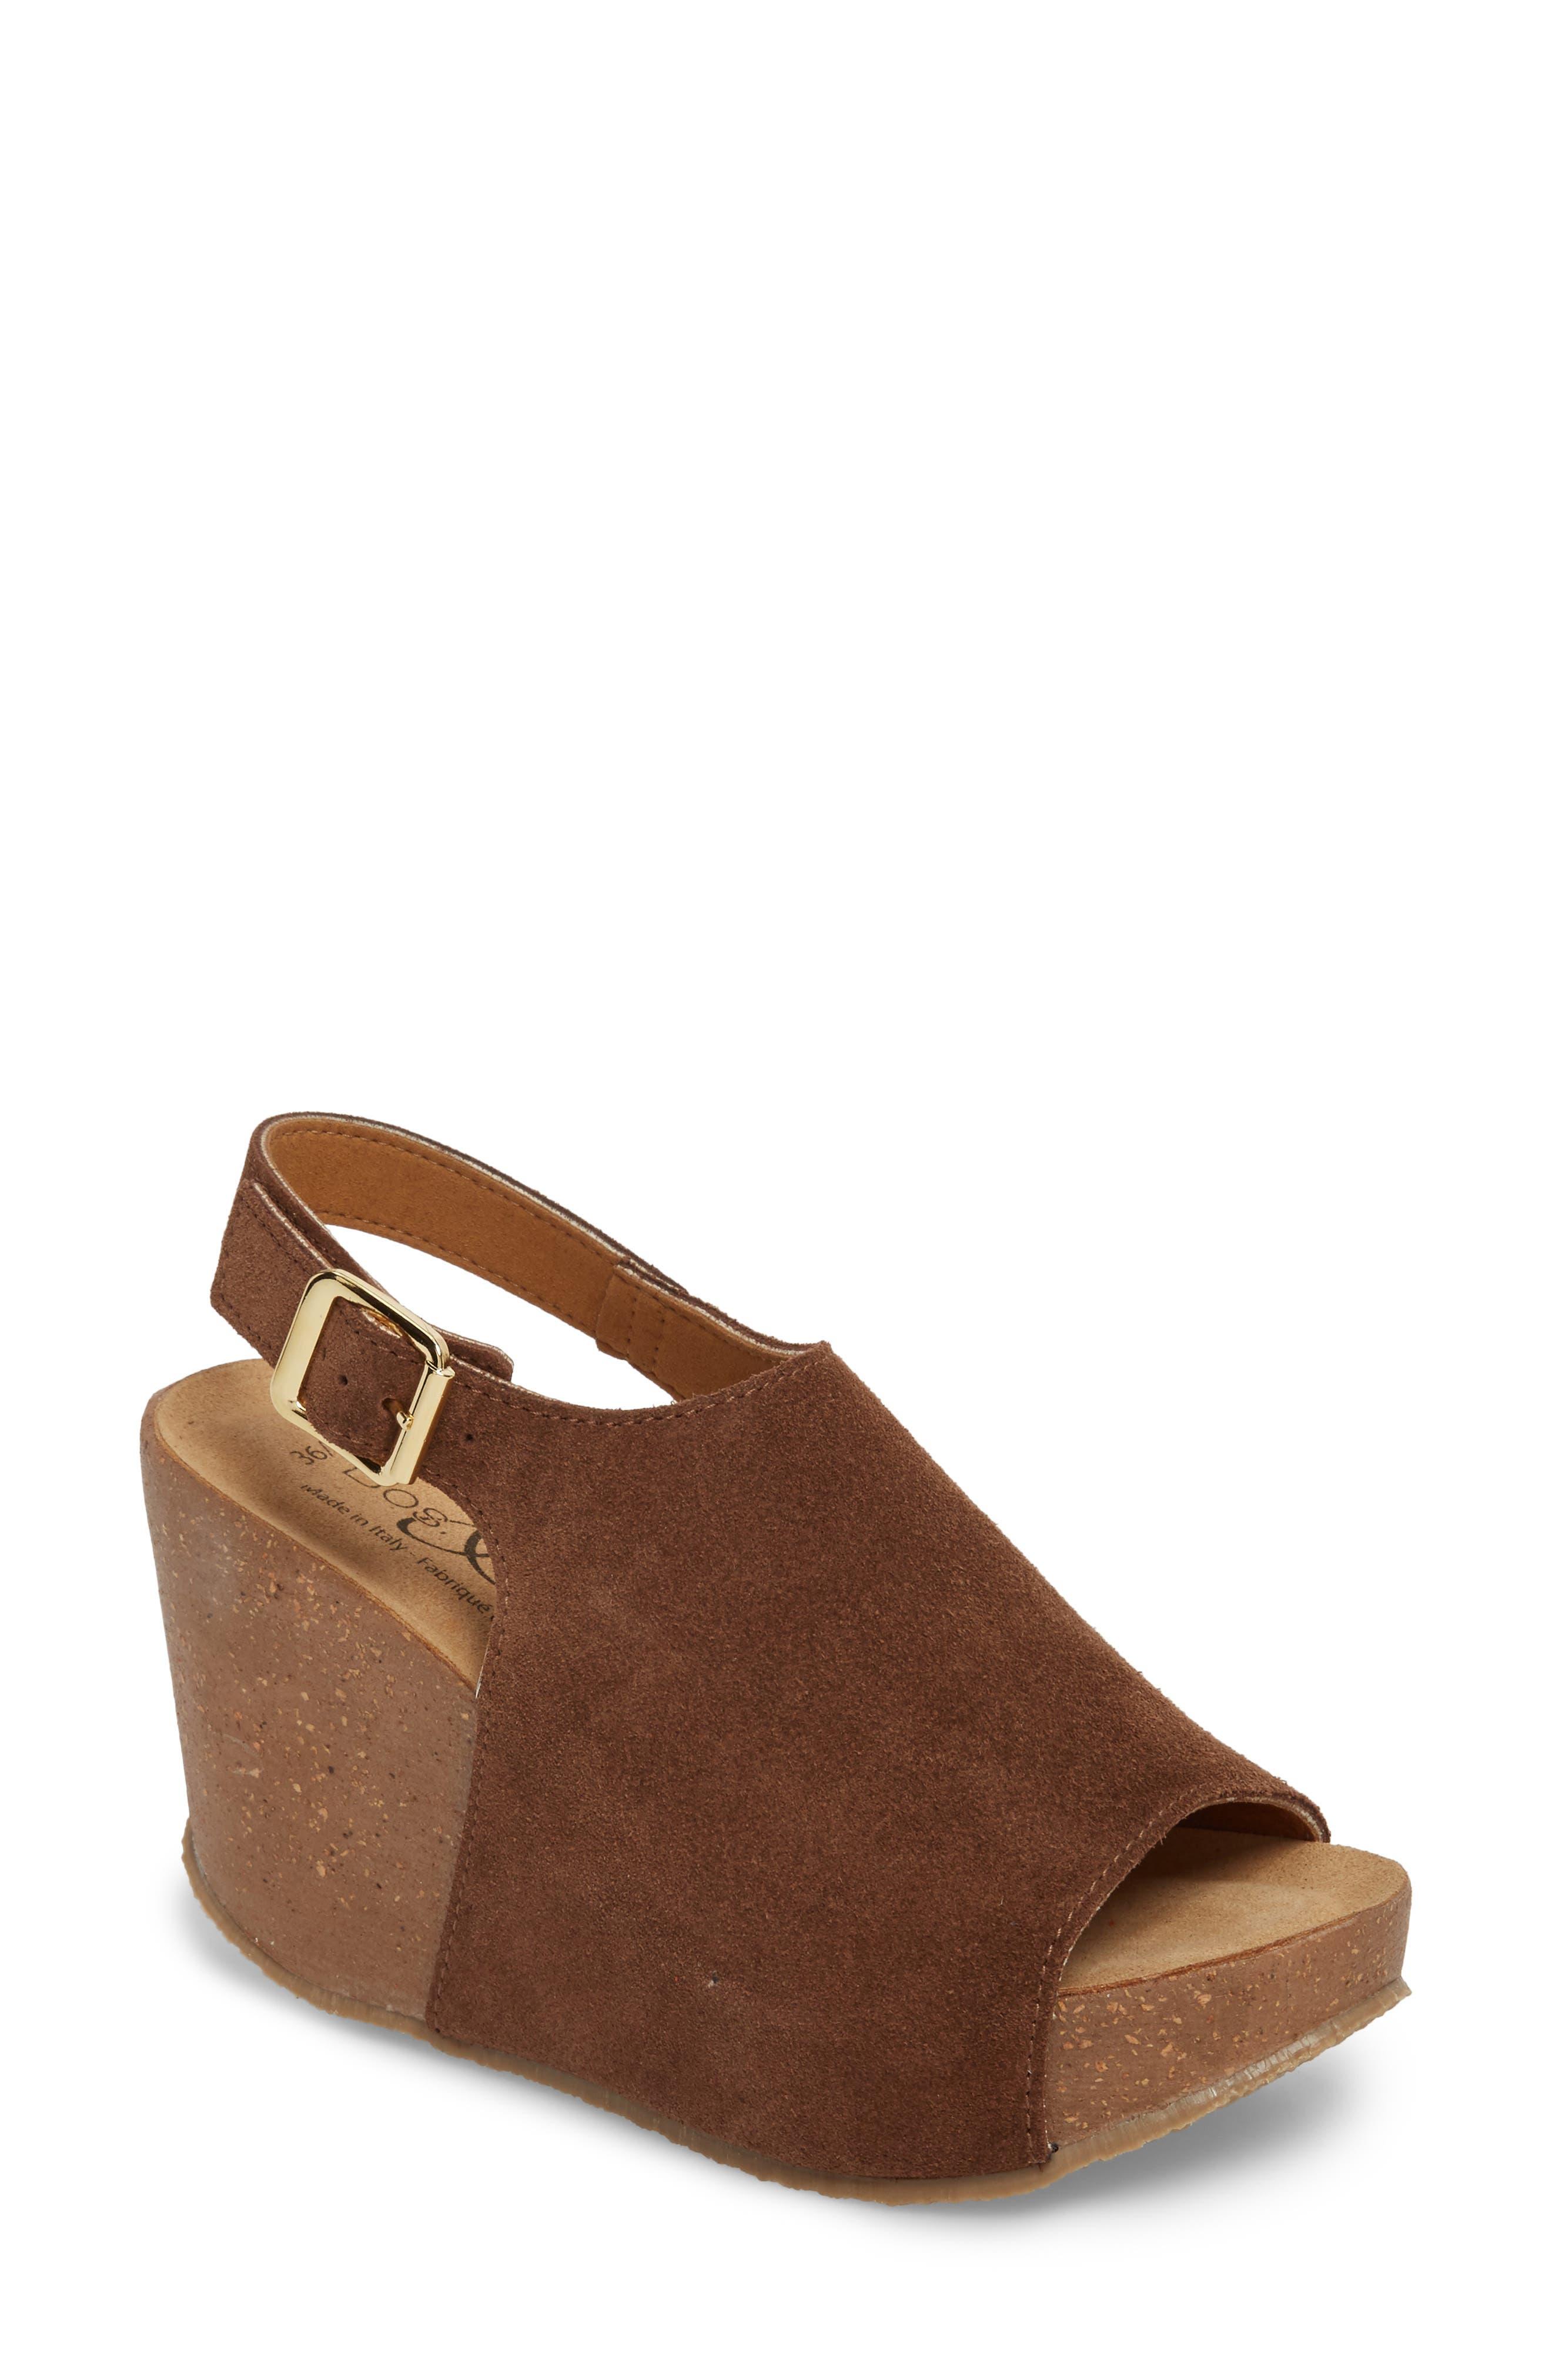 Bos. & Co. Sheila Platform Wedge Sandal - Brown